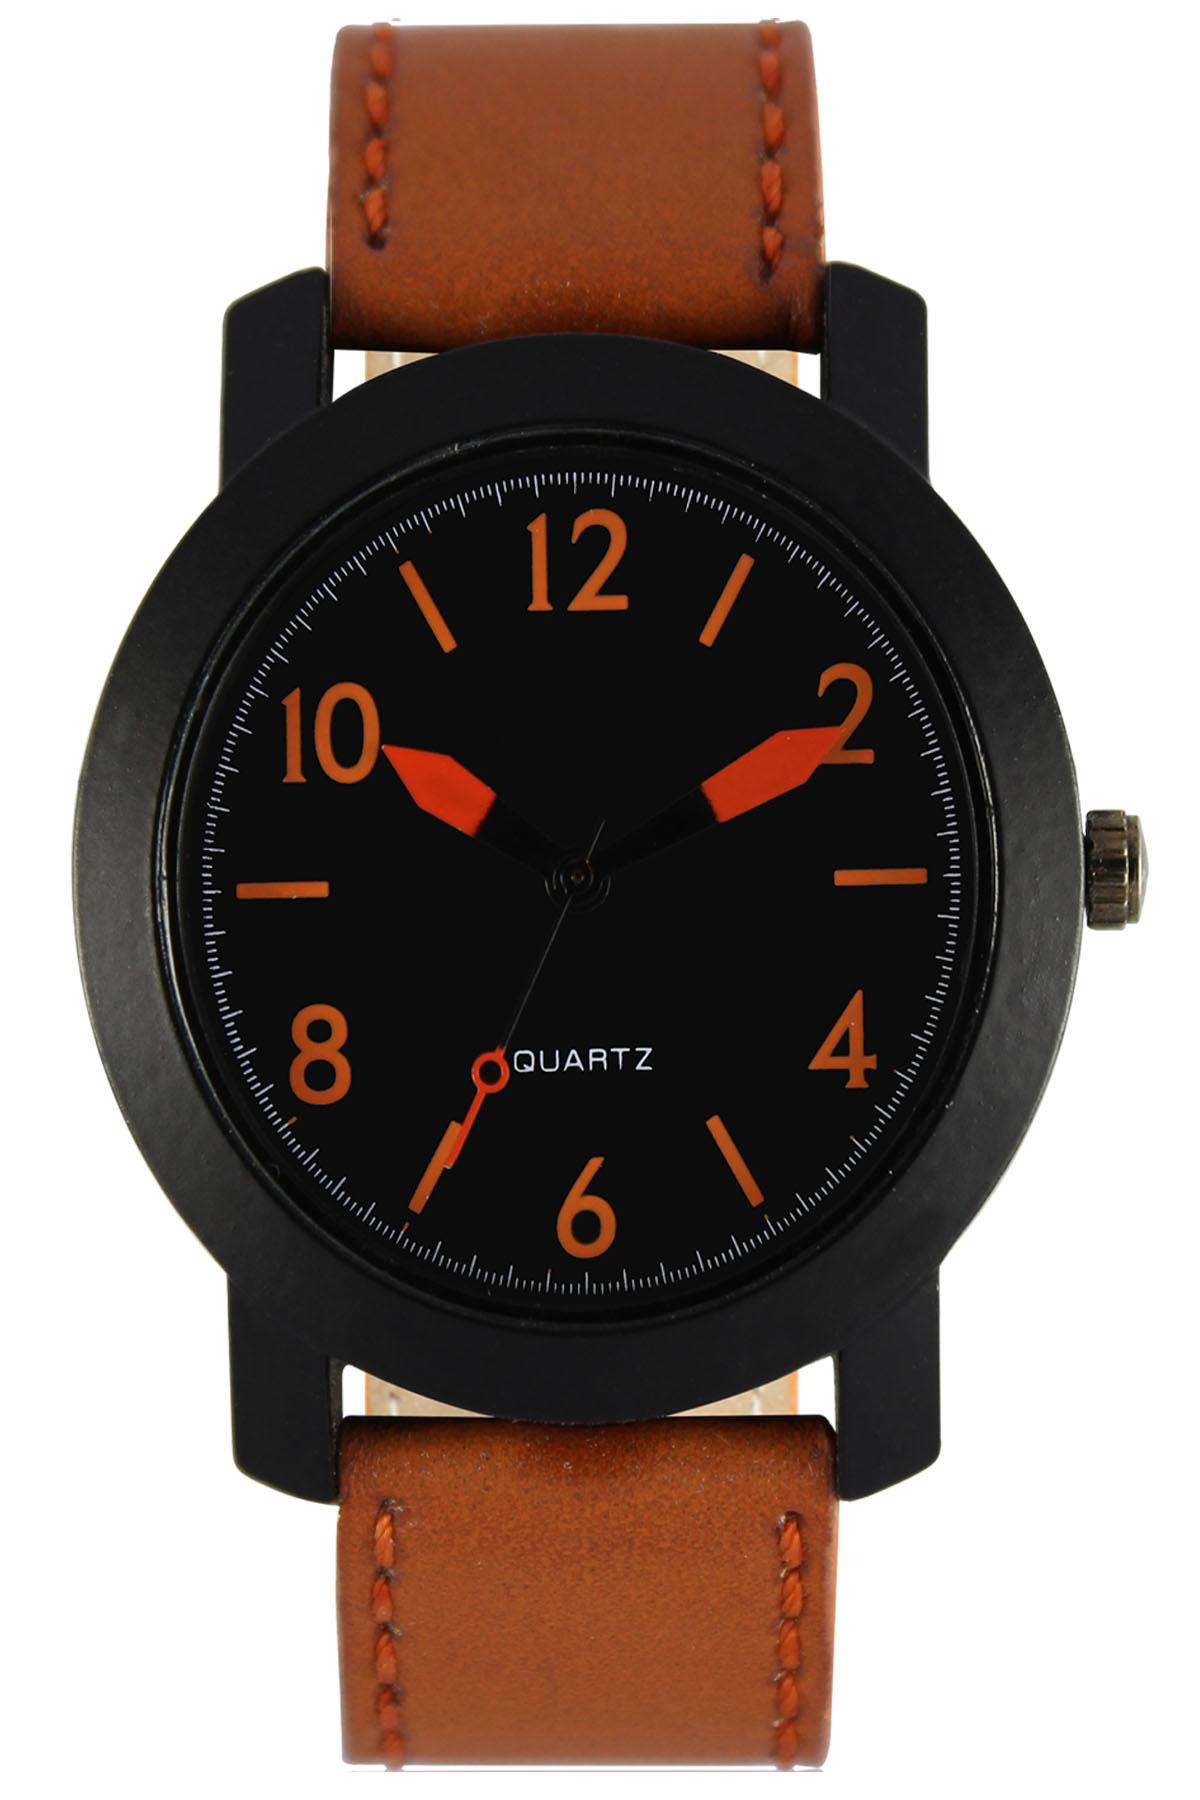 parienterprise Mens Watch Premium 40mm Black Round Dial Brown Leather Strap And Orange Storm Mens Analog Watch 116